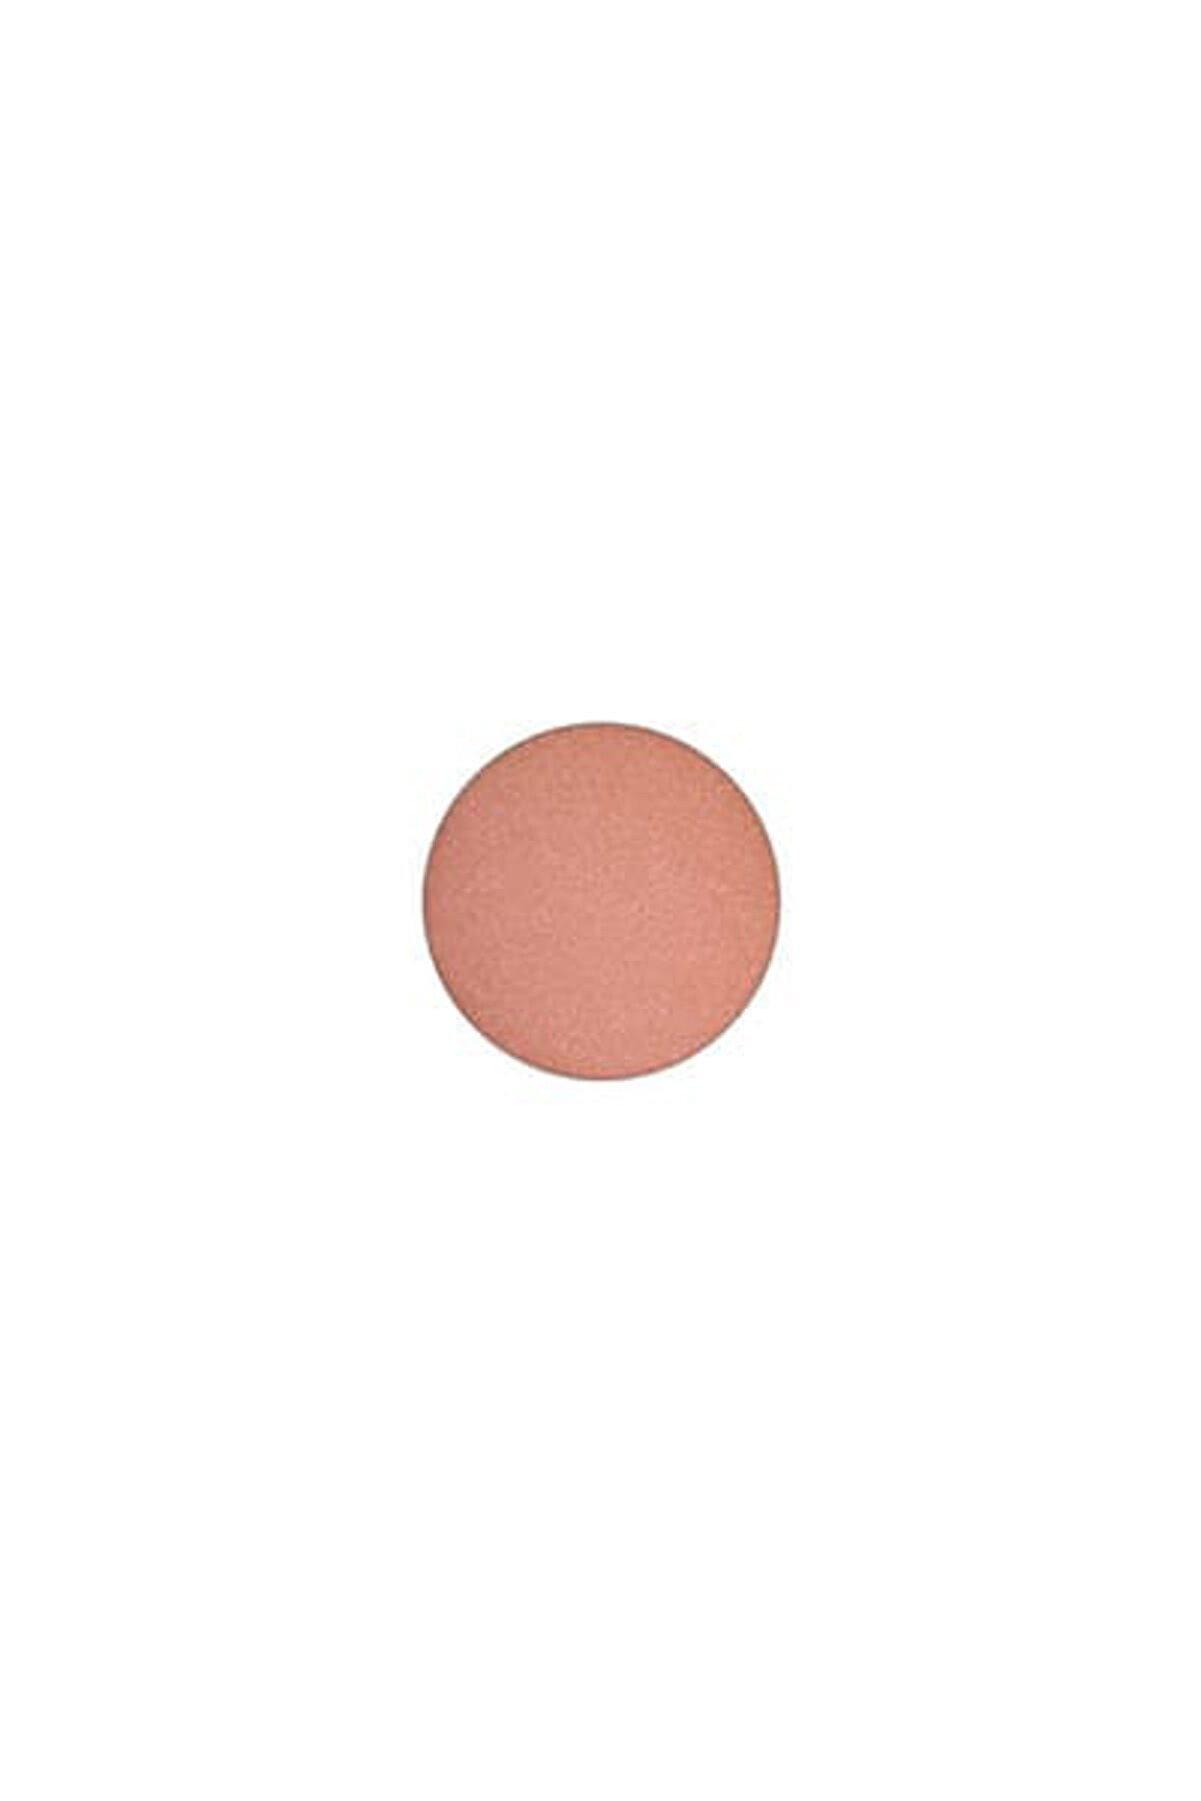 Mac Refill Allık - Powder Blush Pro Palette Refill Pan Sweet As Cocoa 6 g 773602104680